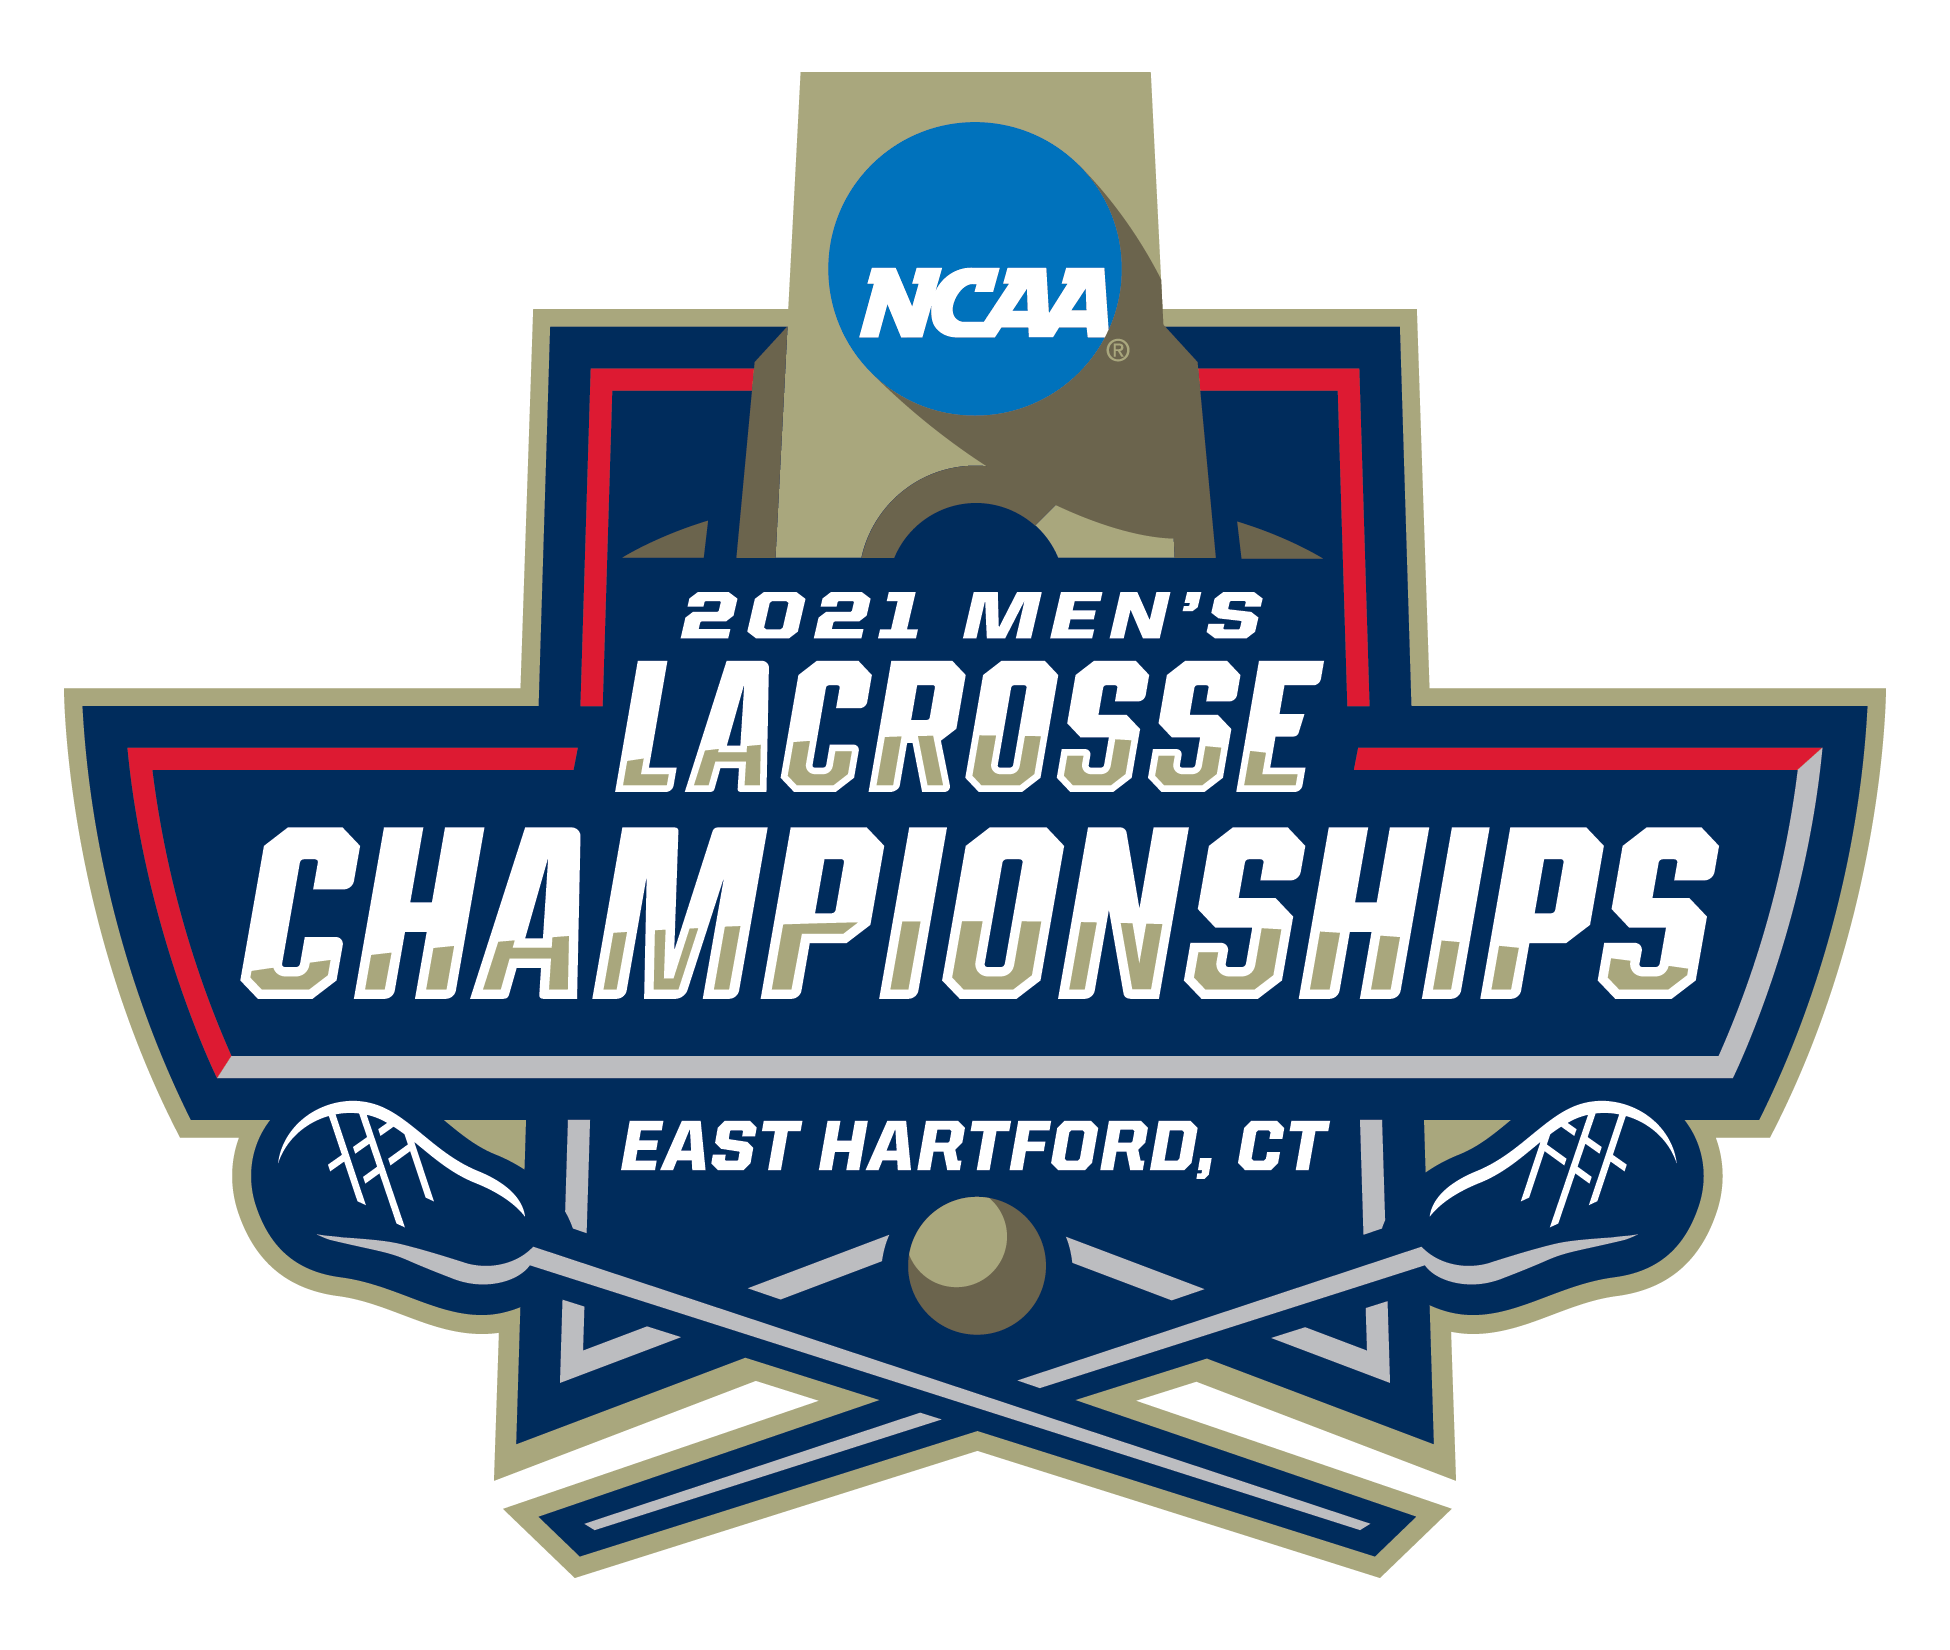 2021 DI Men's Lacrosse Championship